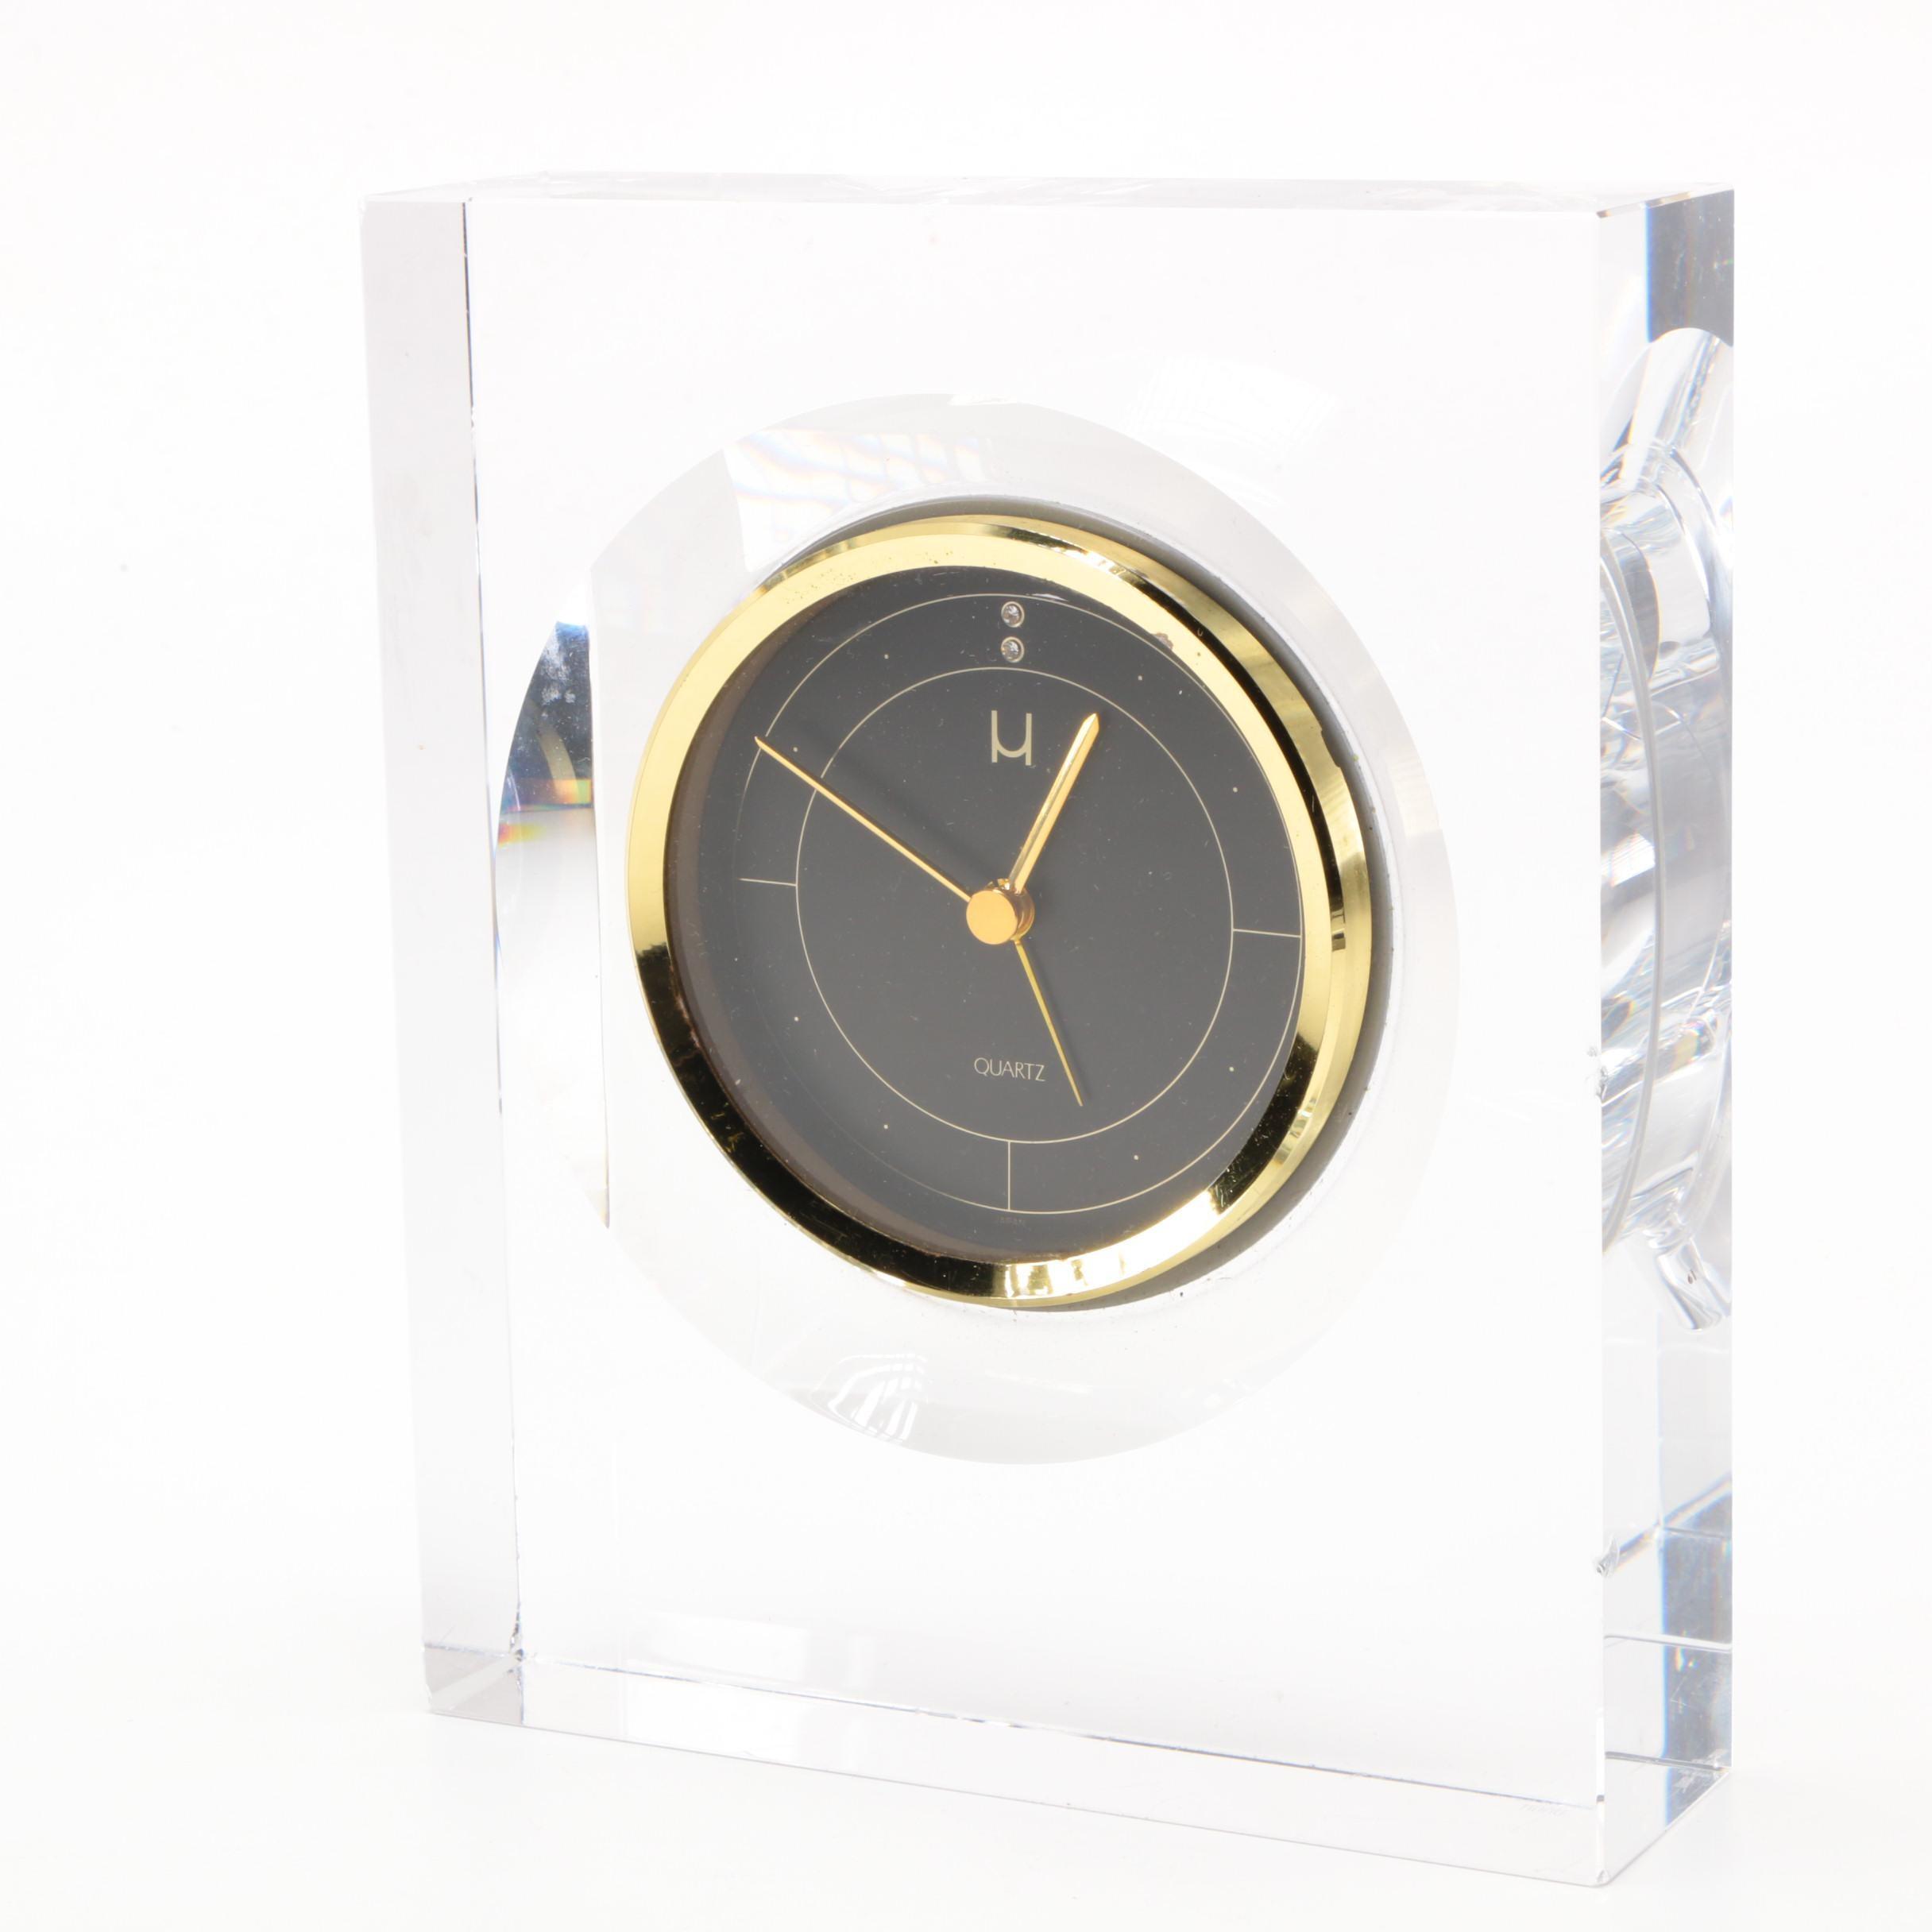 Hoya Crystal Mantel Clock